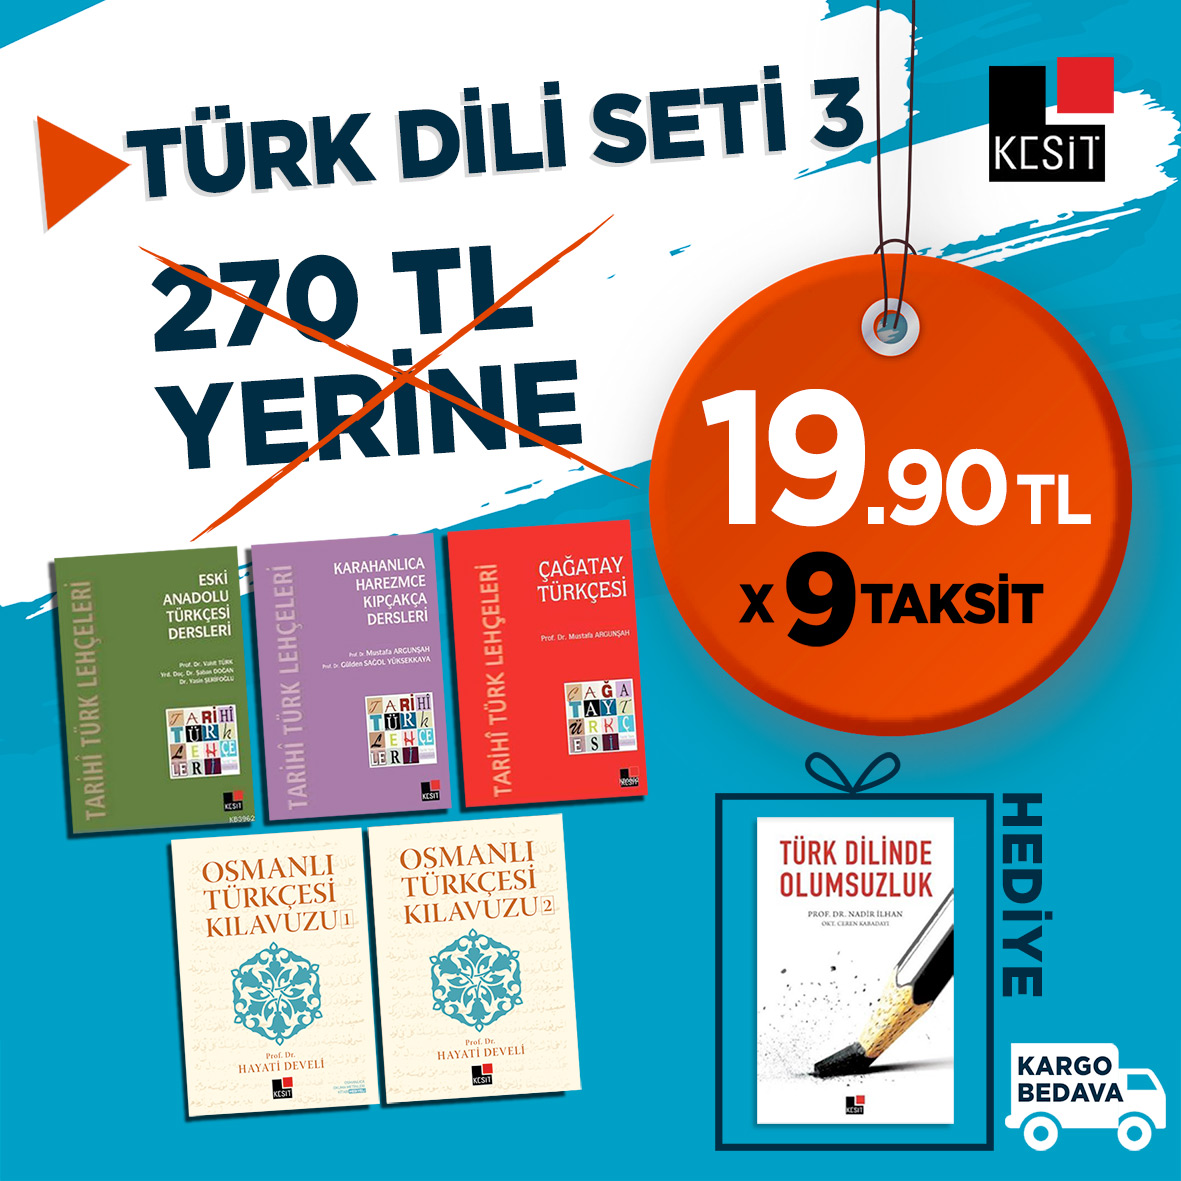 Türk Dili Seti 3